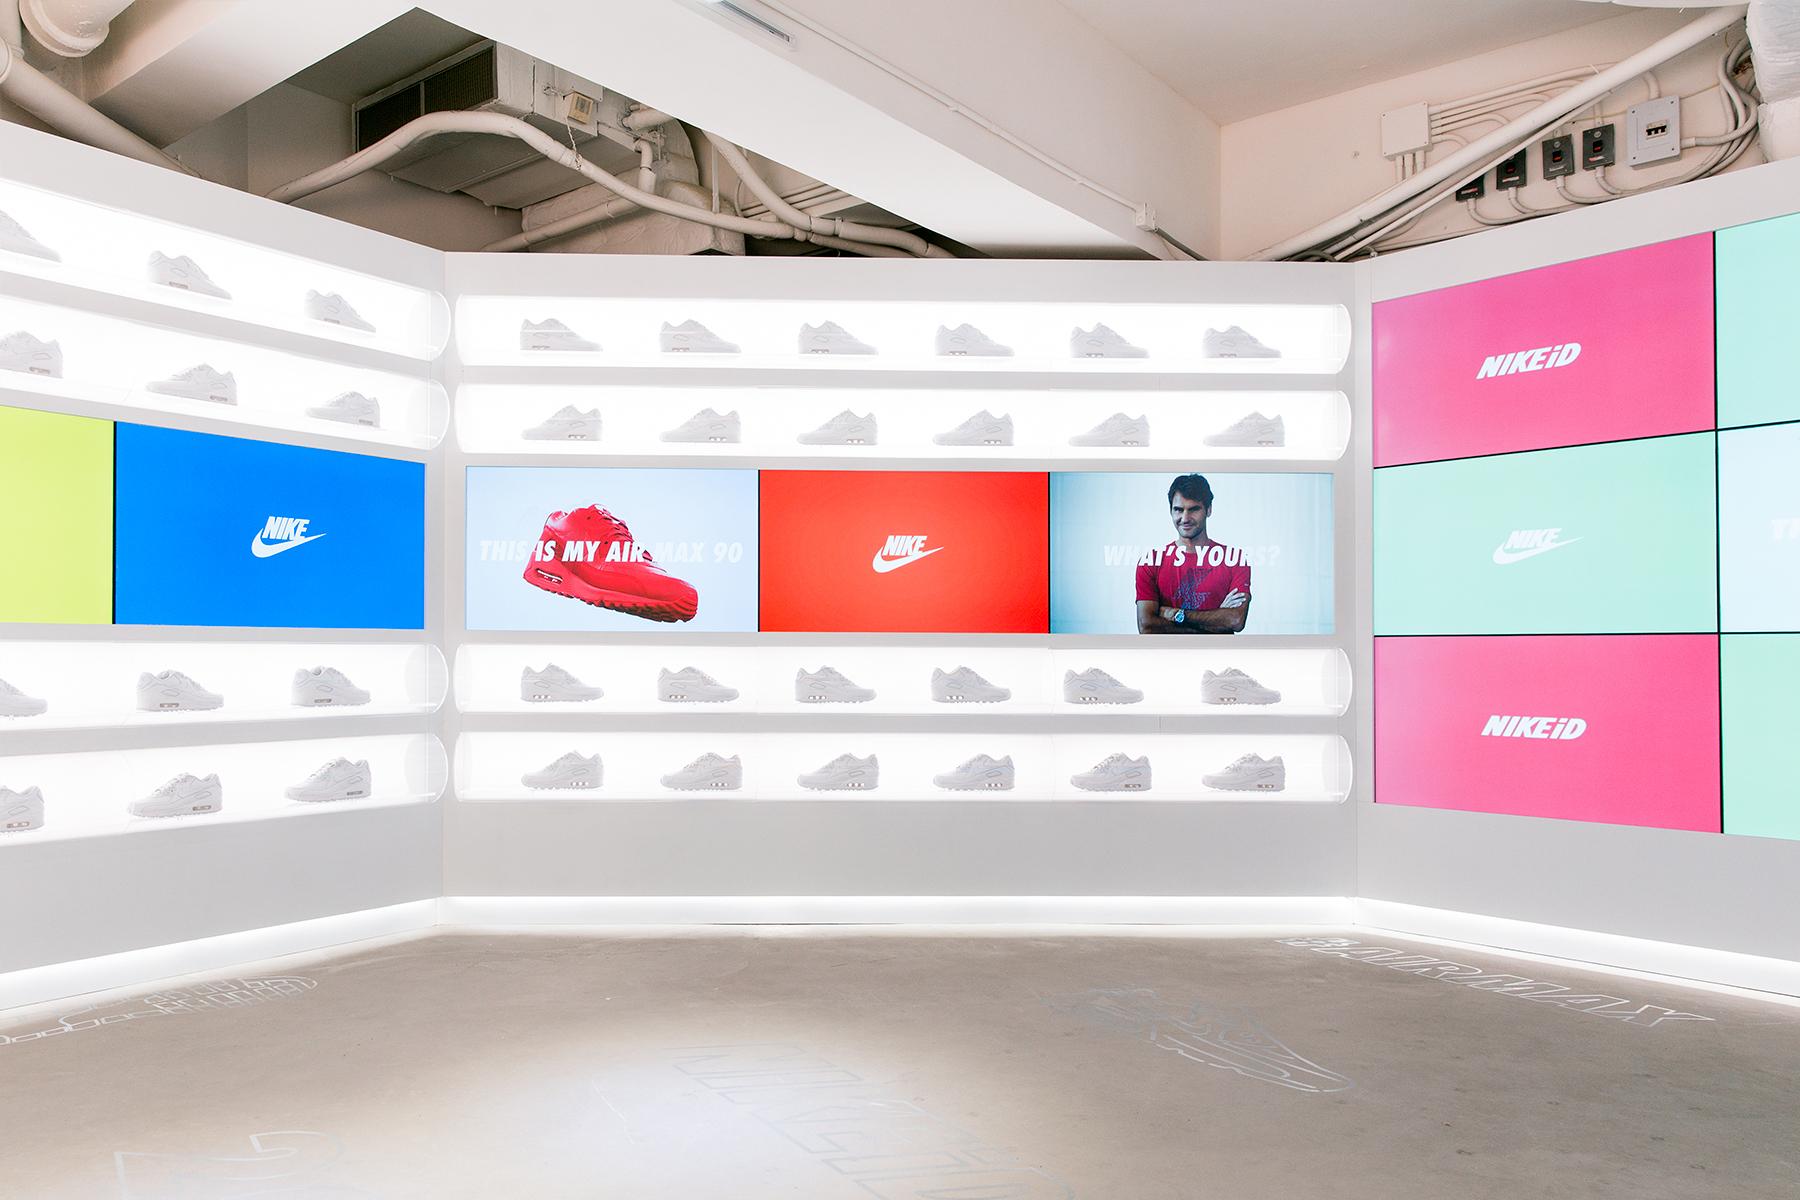 Inside Hong Kong's Dedicated NIKEiD Air Max Pop-up Shop